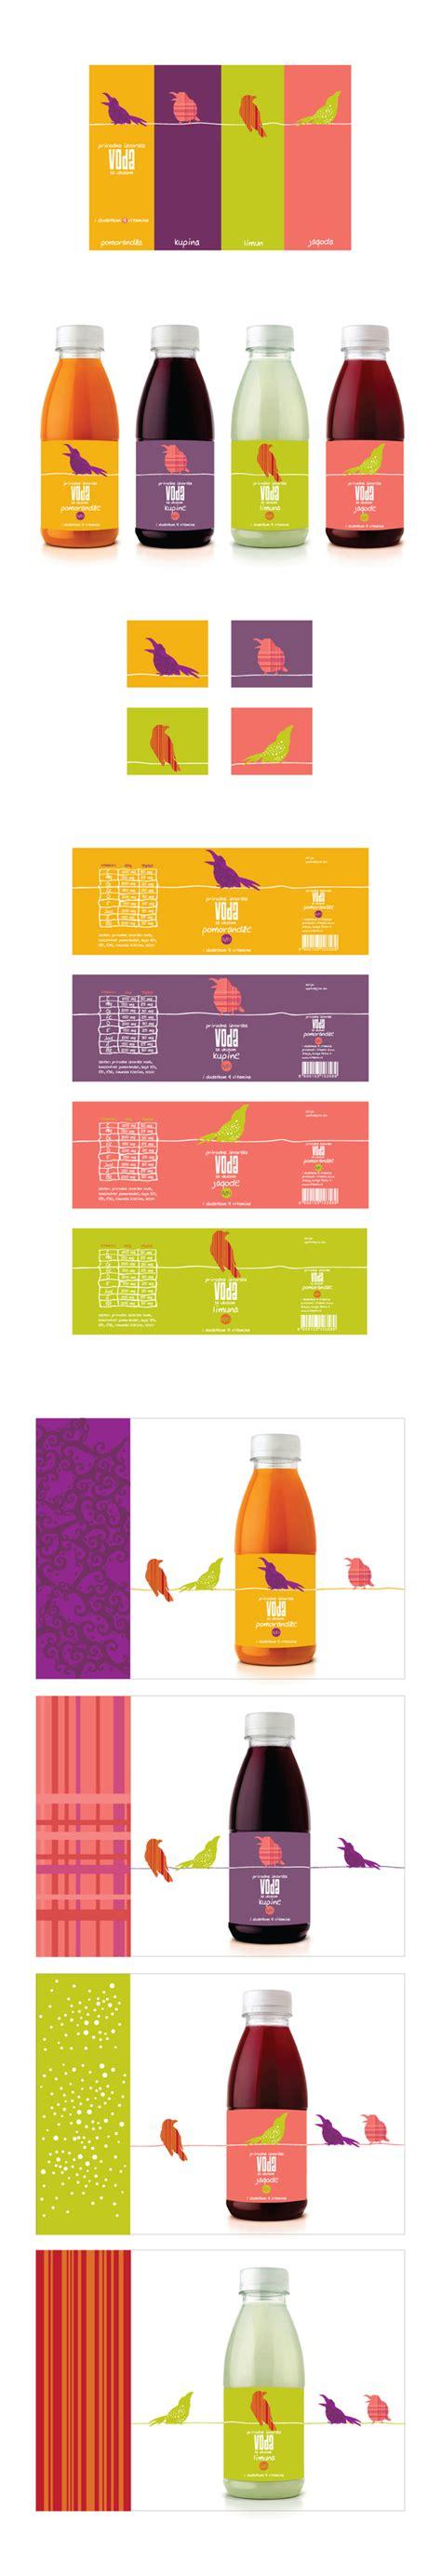 label design behance label design for flavored water on behance